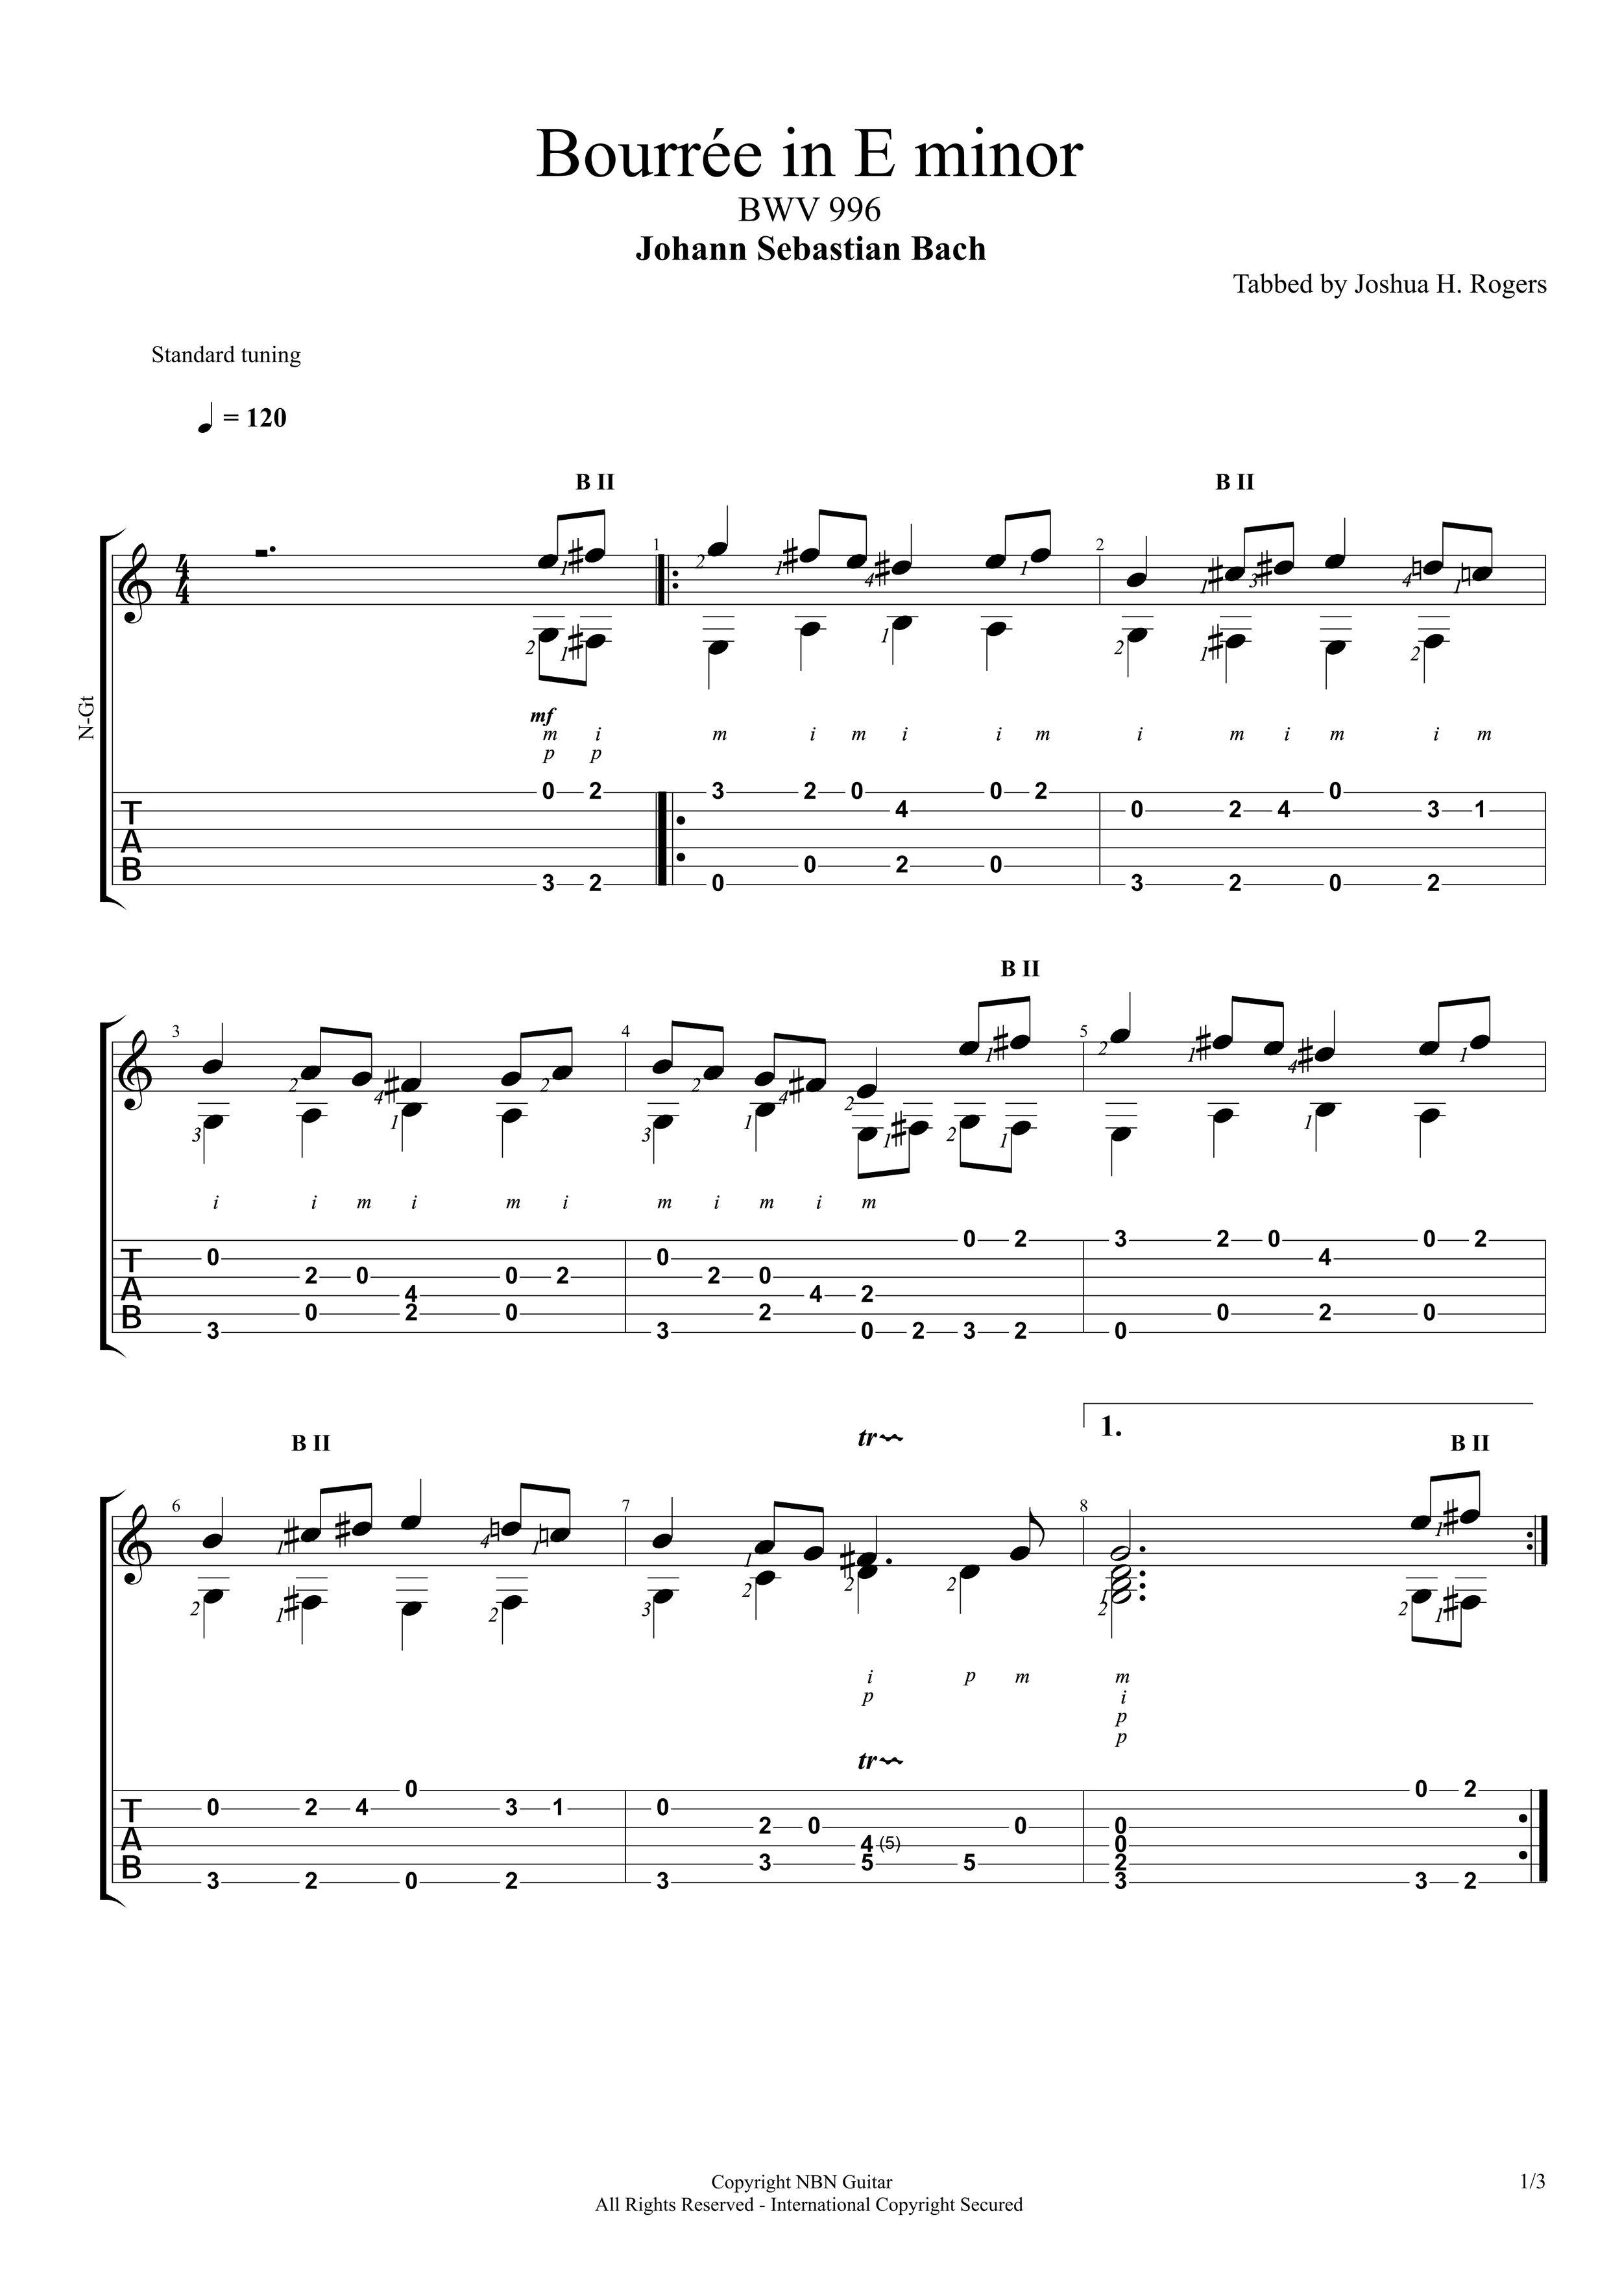 Bourrée in E-minor BWV996 (Sheet Music & Tabs)-p3.jpg